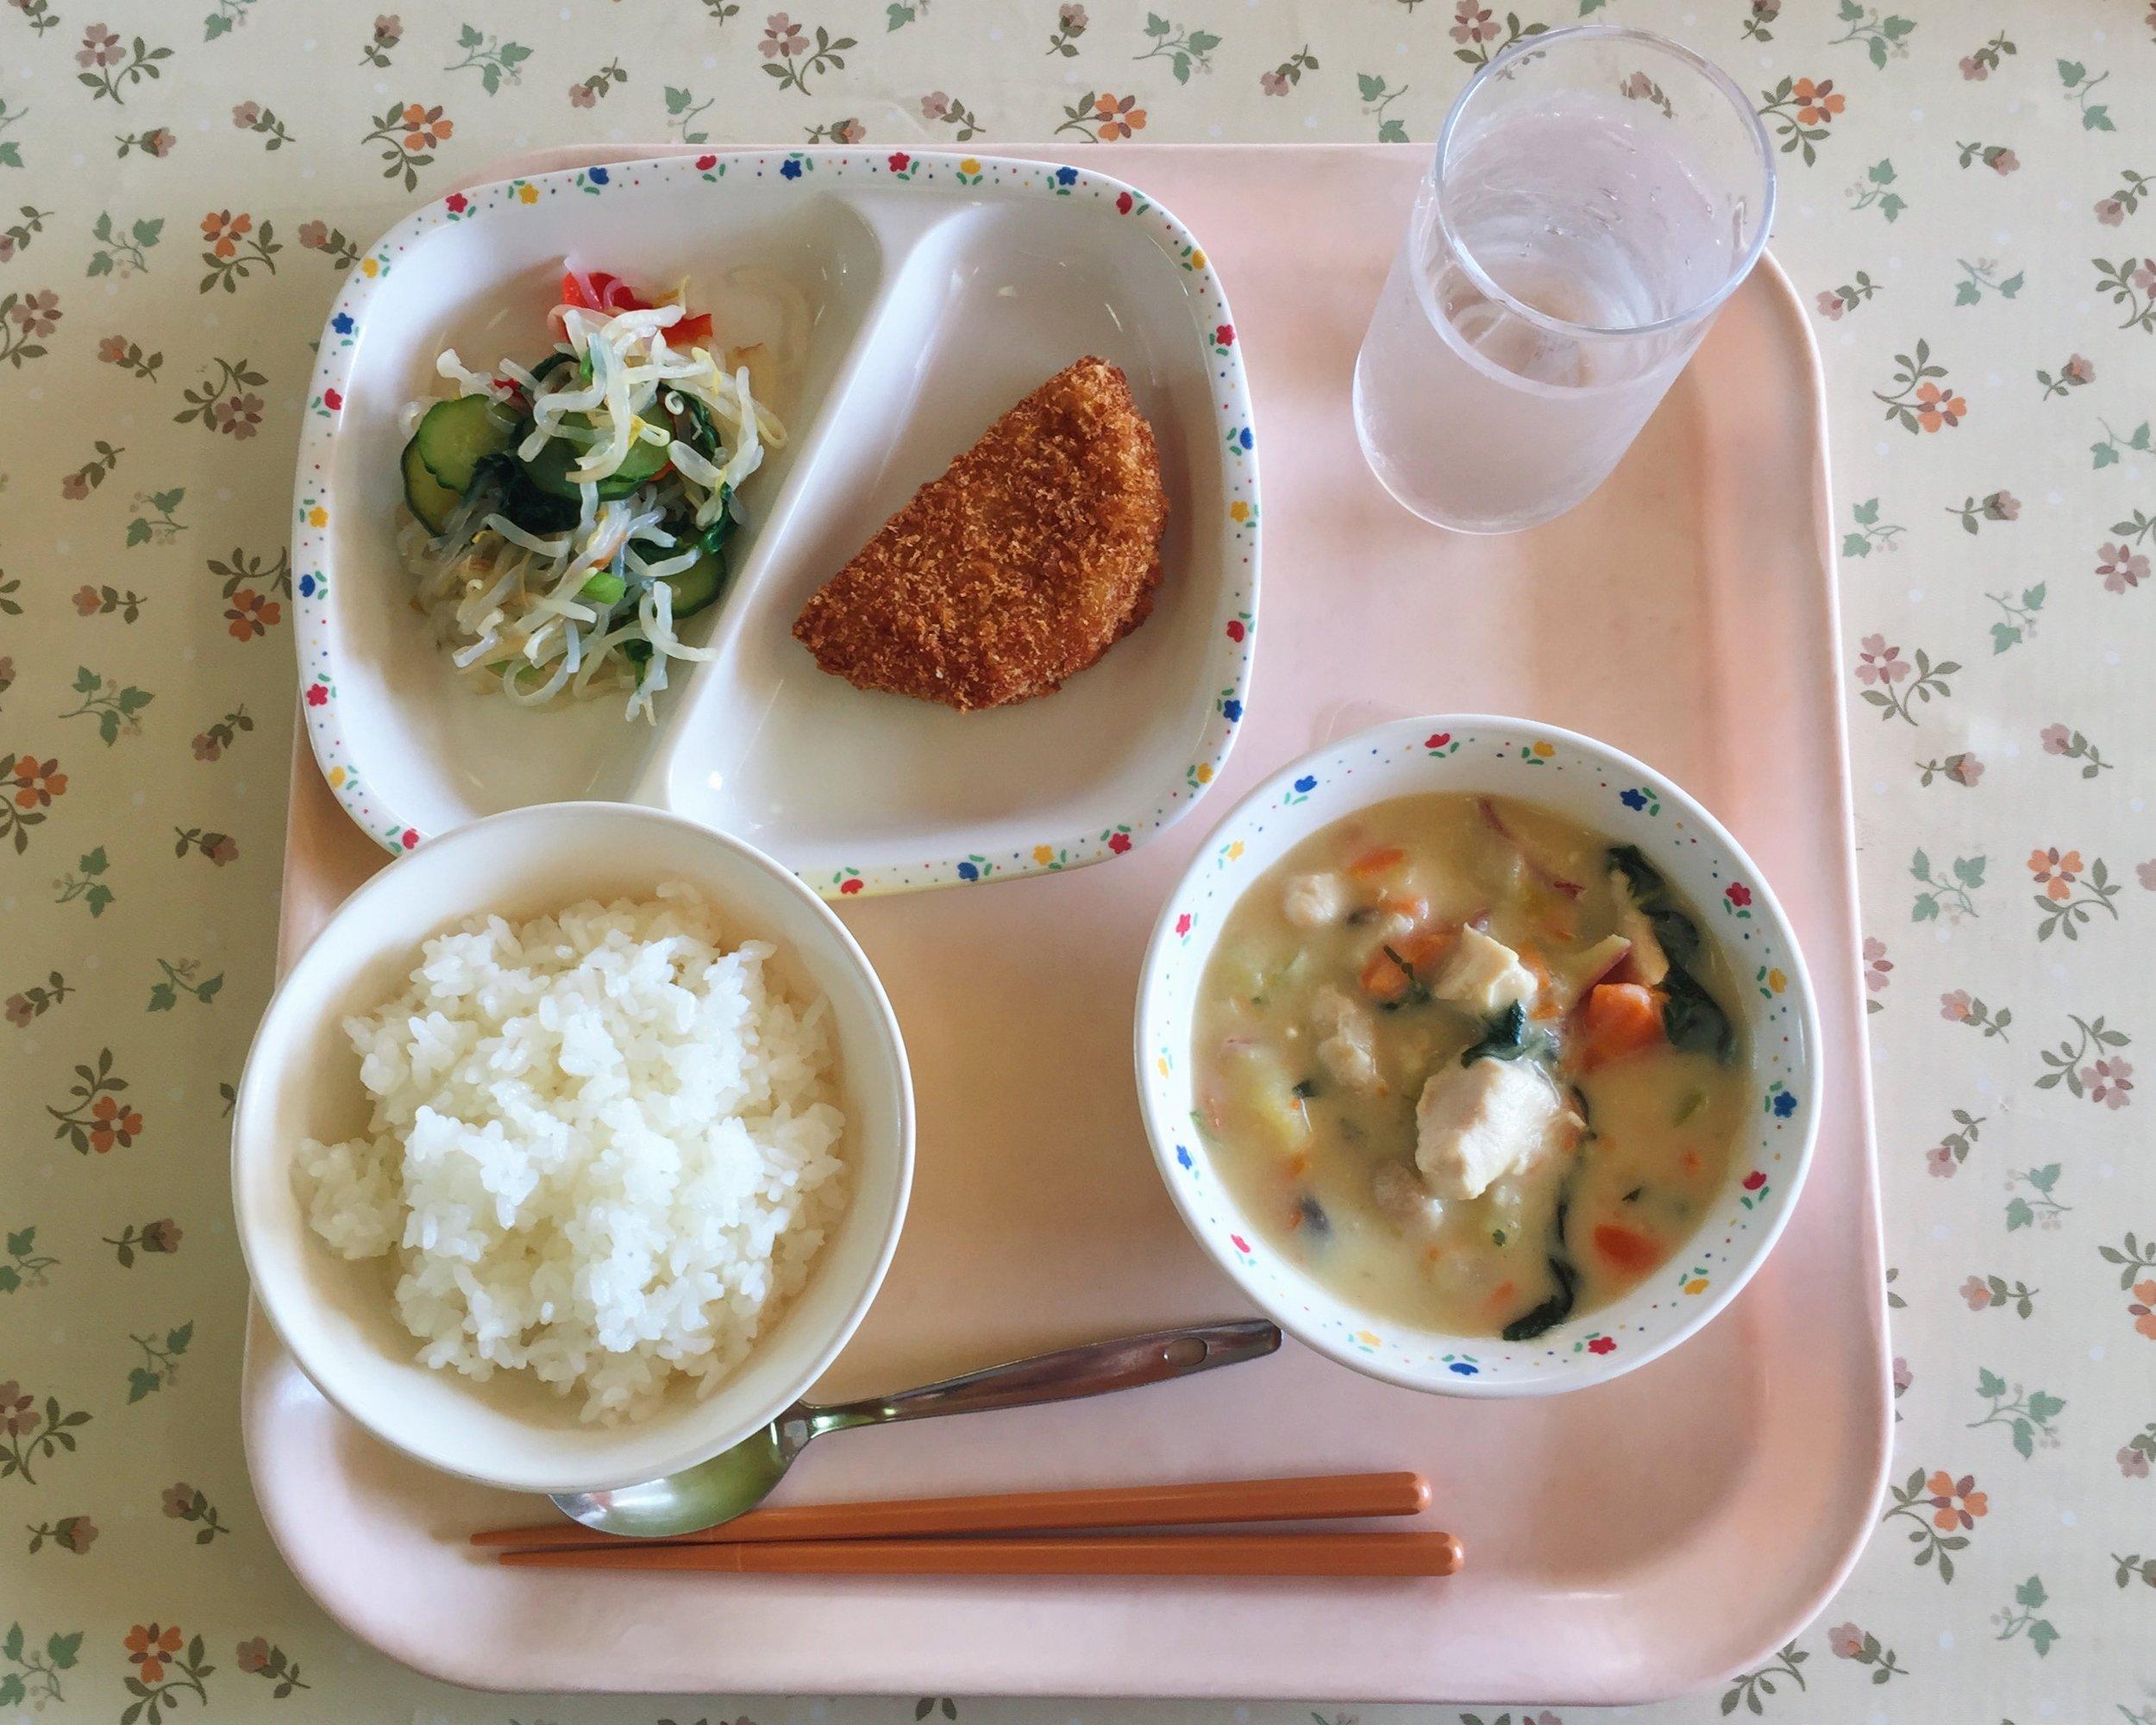 Ham cutlet, konnyaku salad, sweet potato cream stew, and white rice